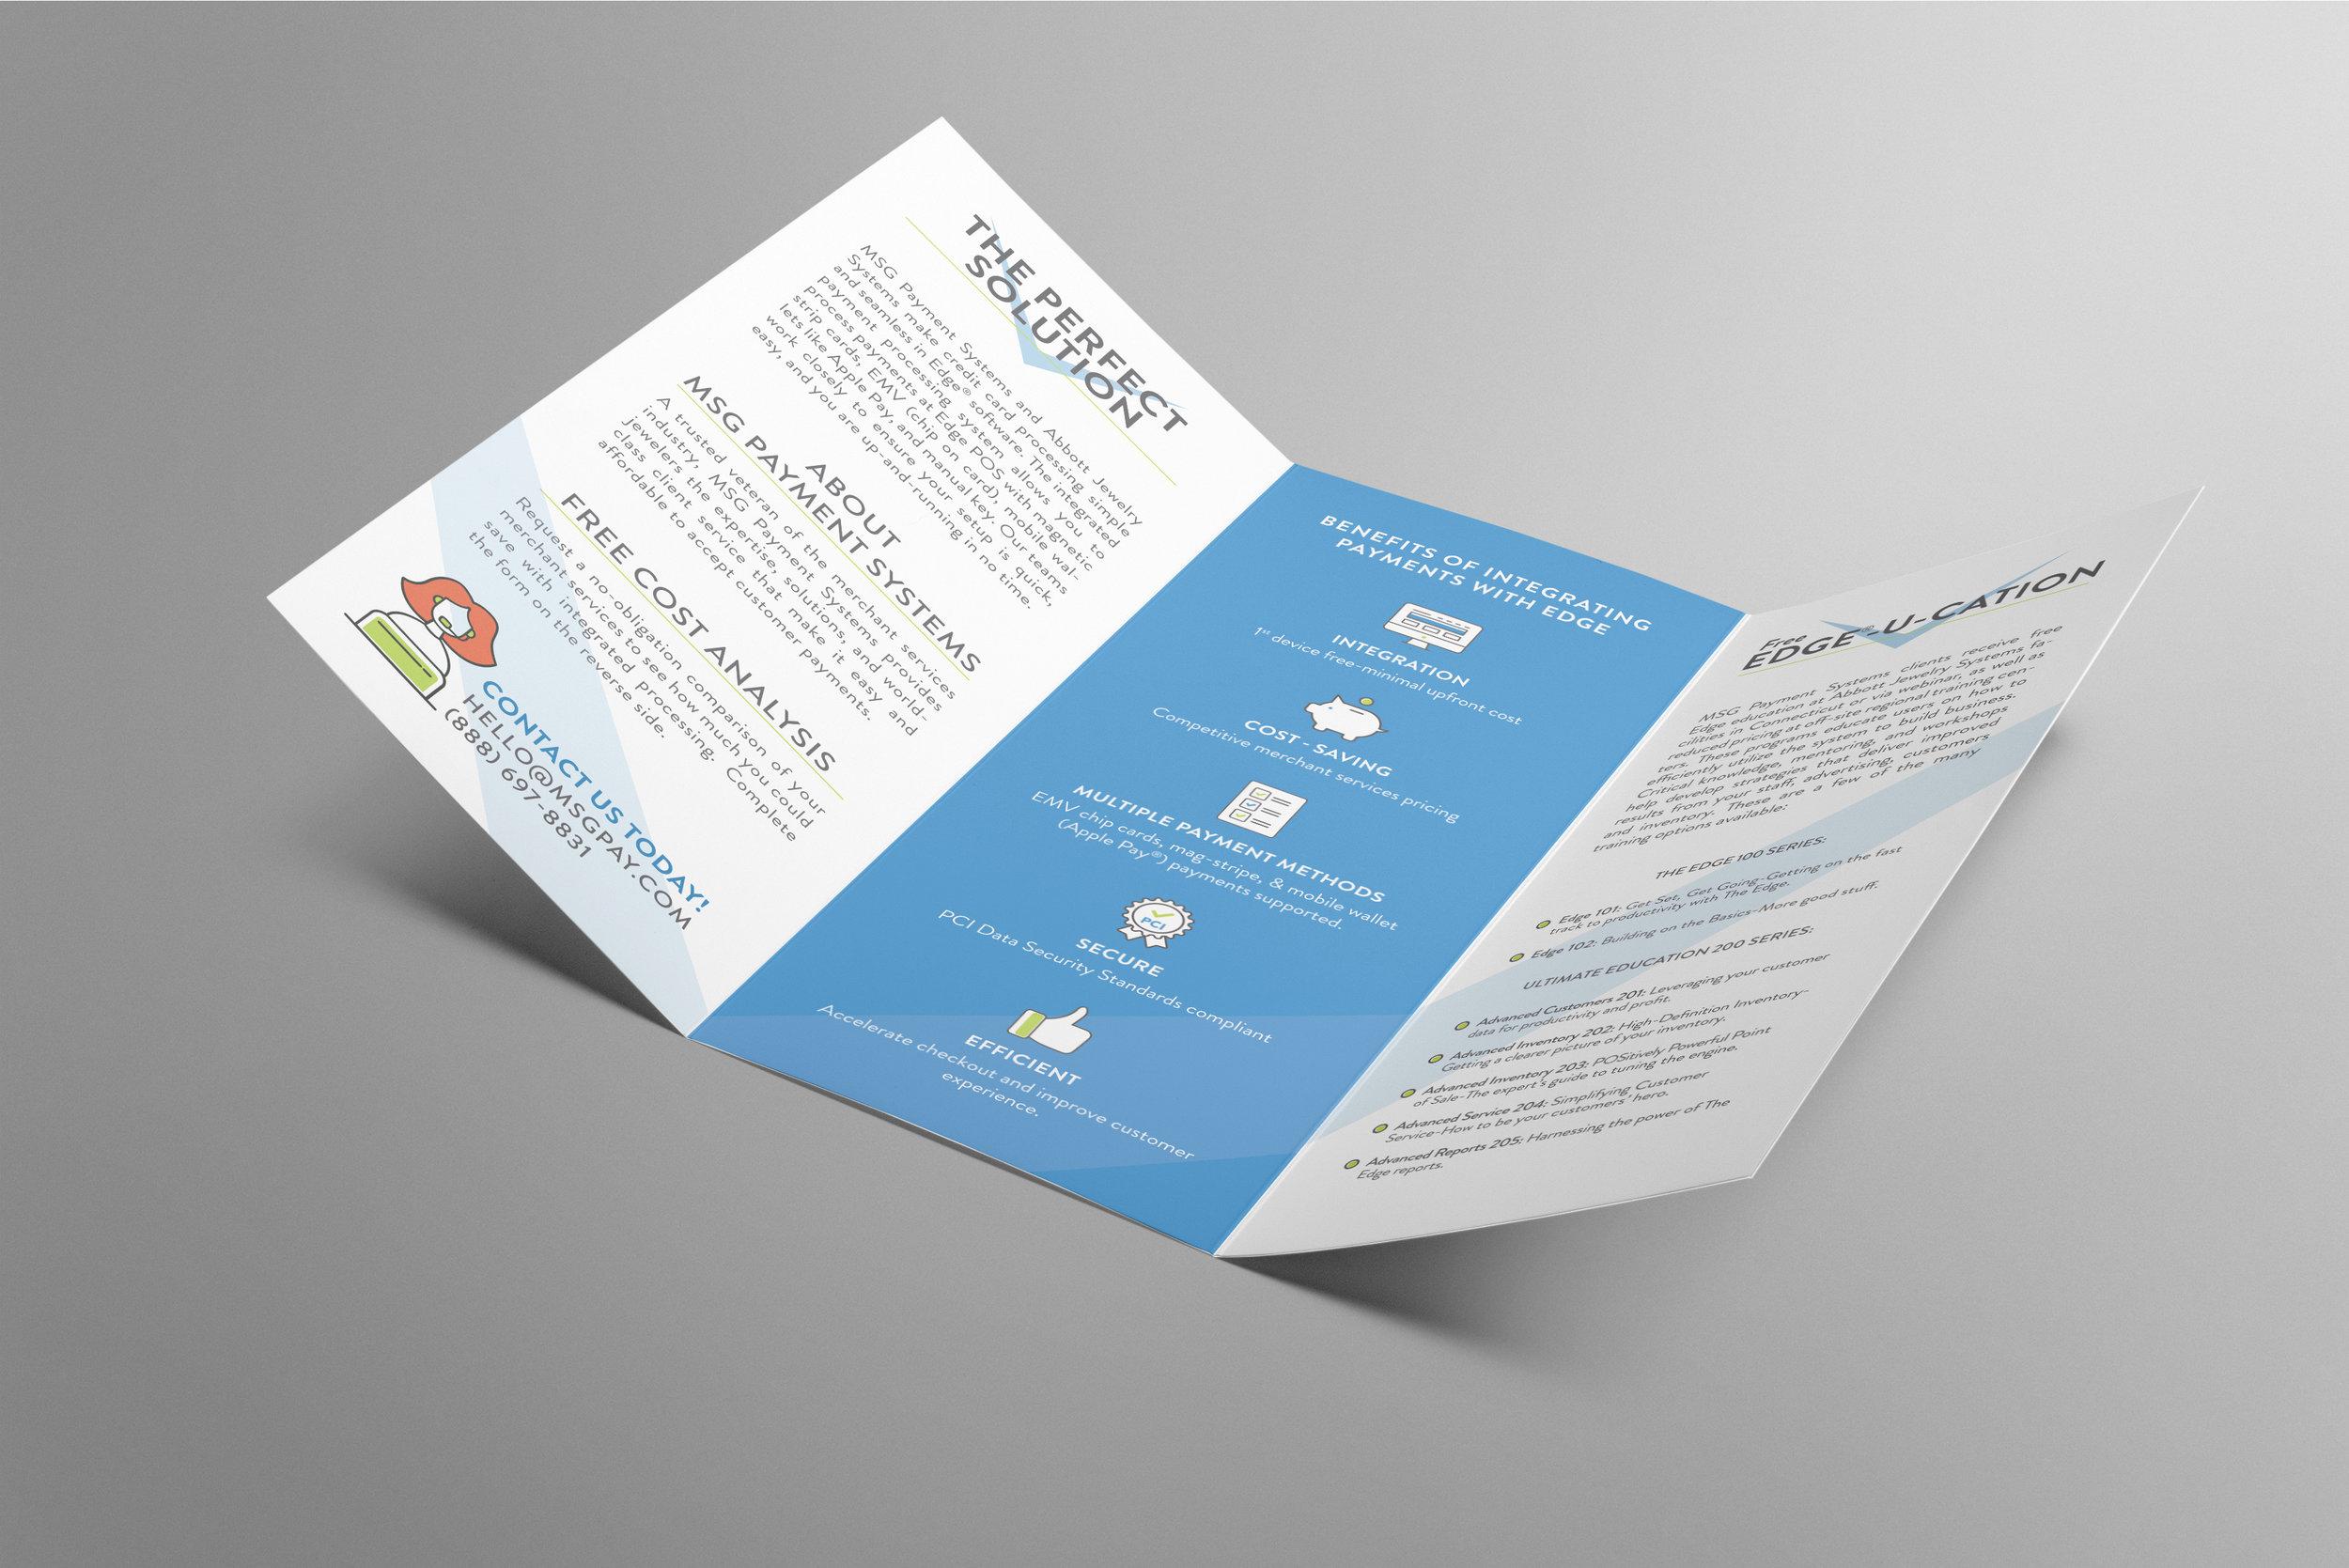 02-tri-fold-brochure-letter-mockup2.jpg